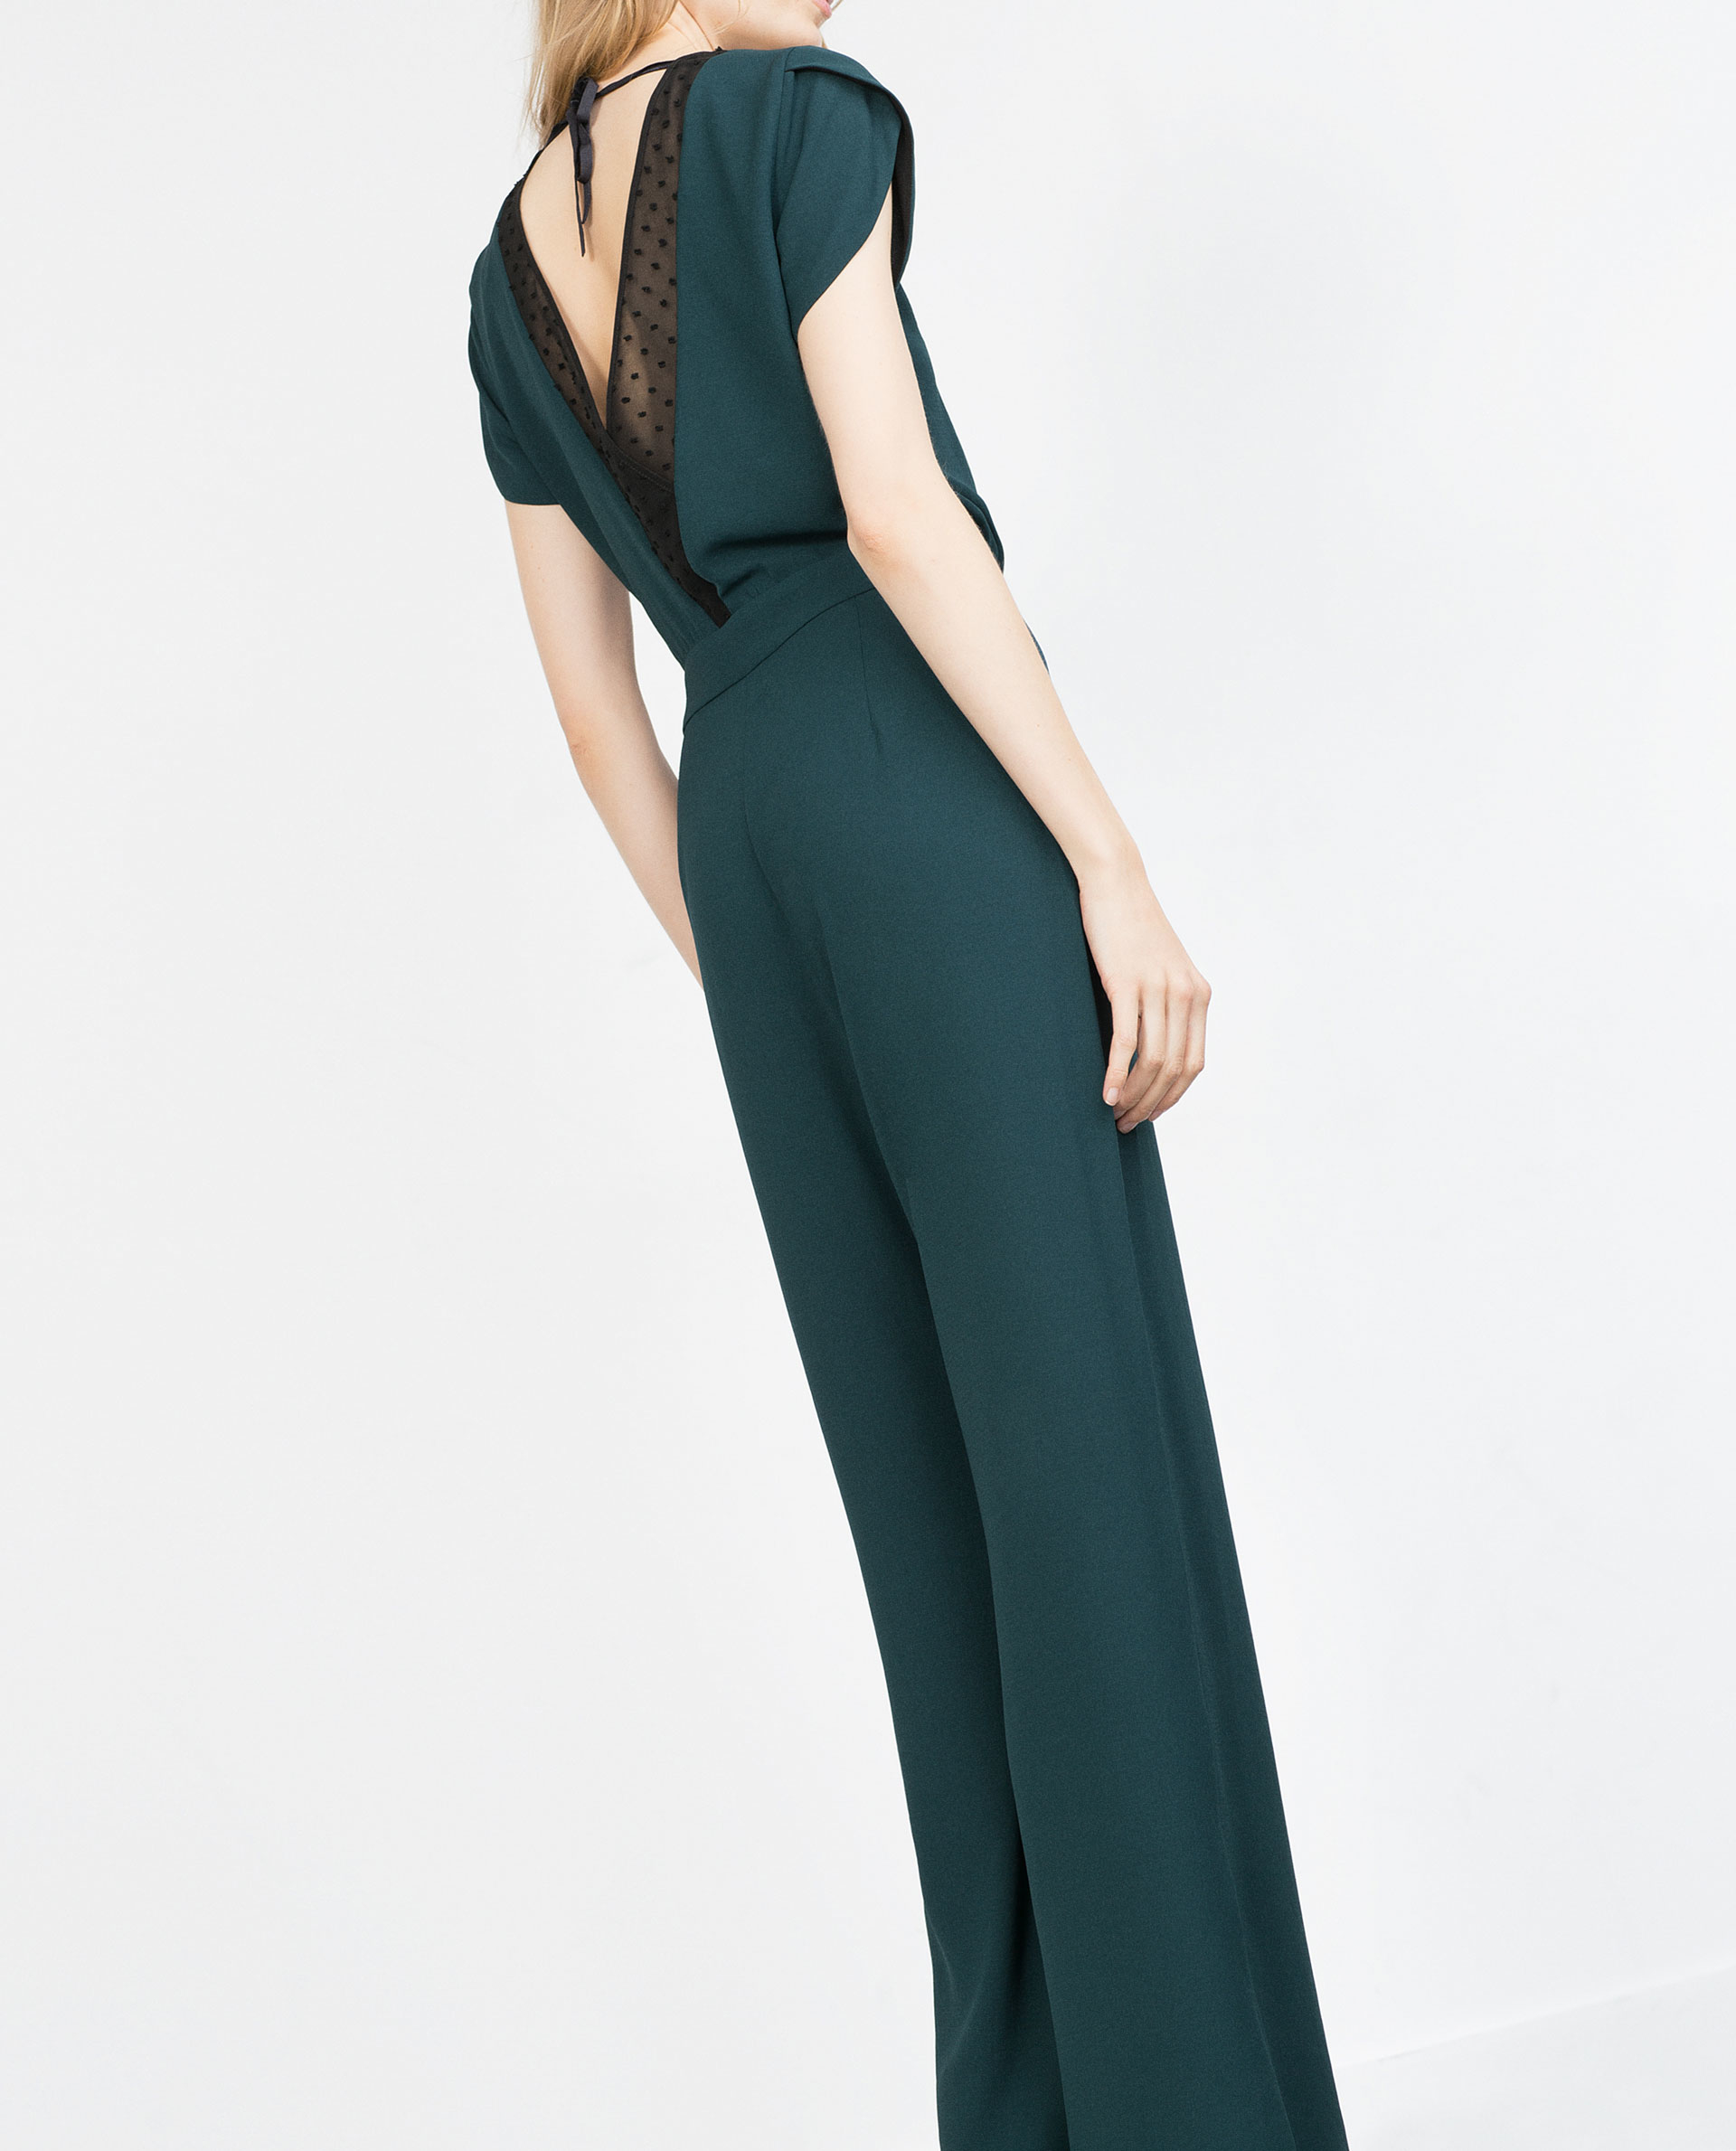 Cool Zara Jumpsuits  Green Sandals